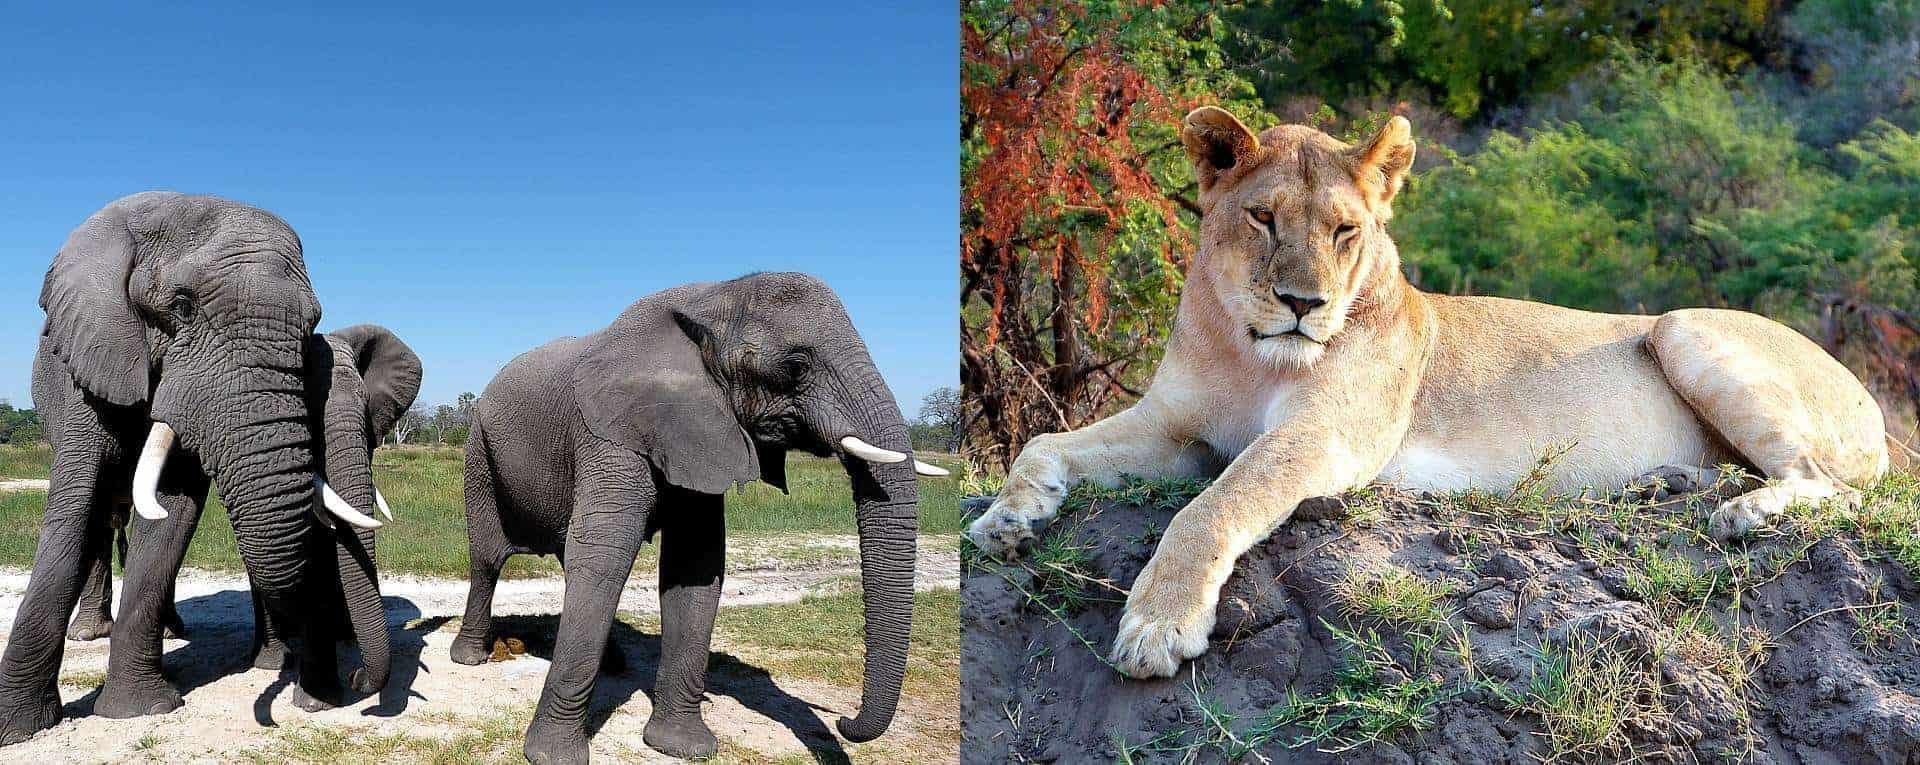 AfricanMecca Safaris - Distinctive Travel & Wildlife Tour Experts